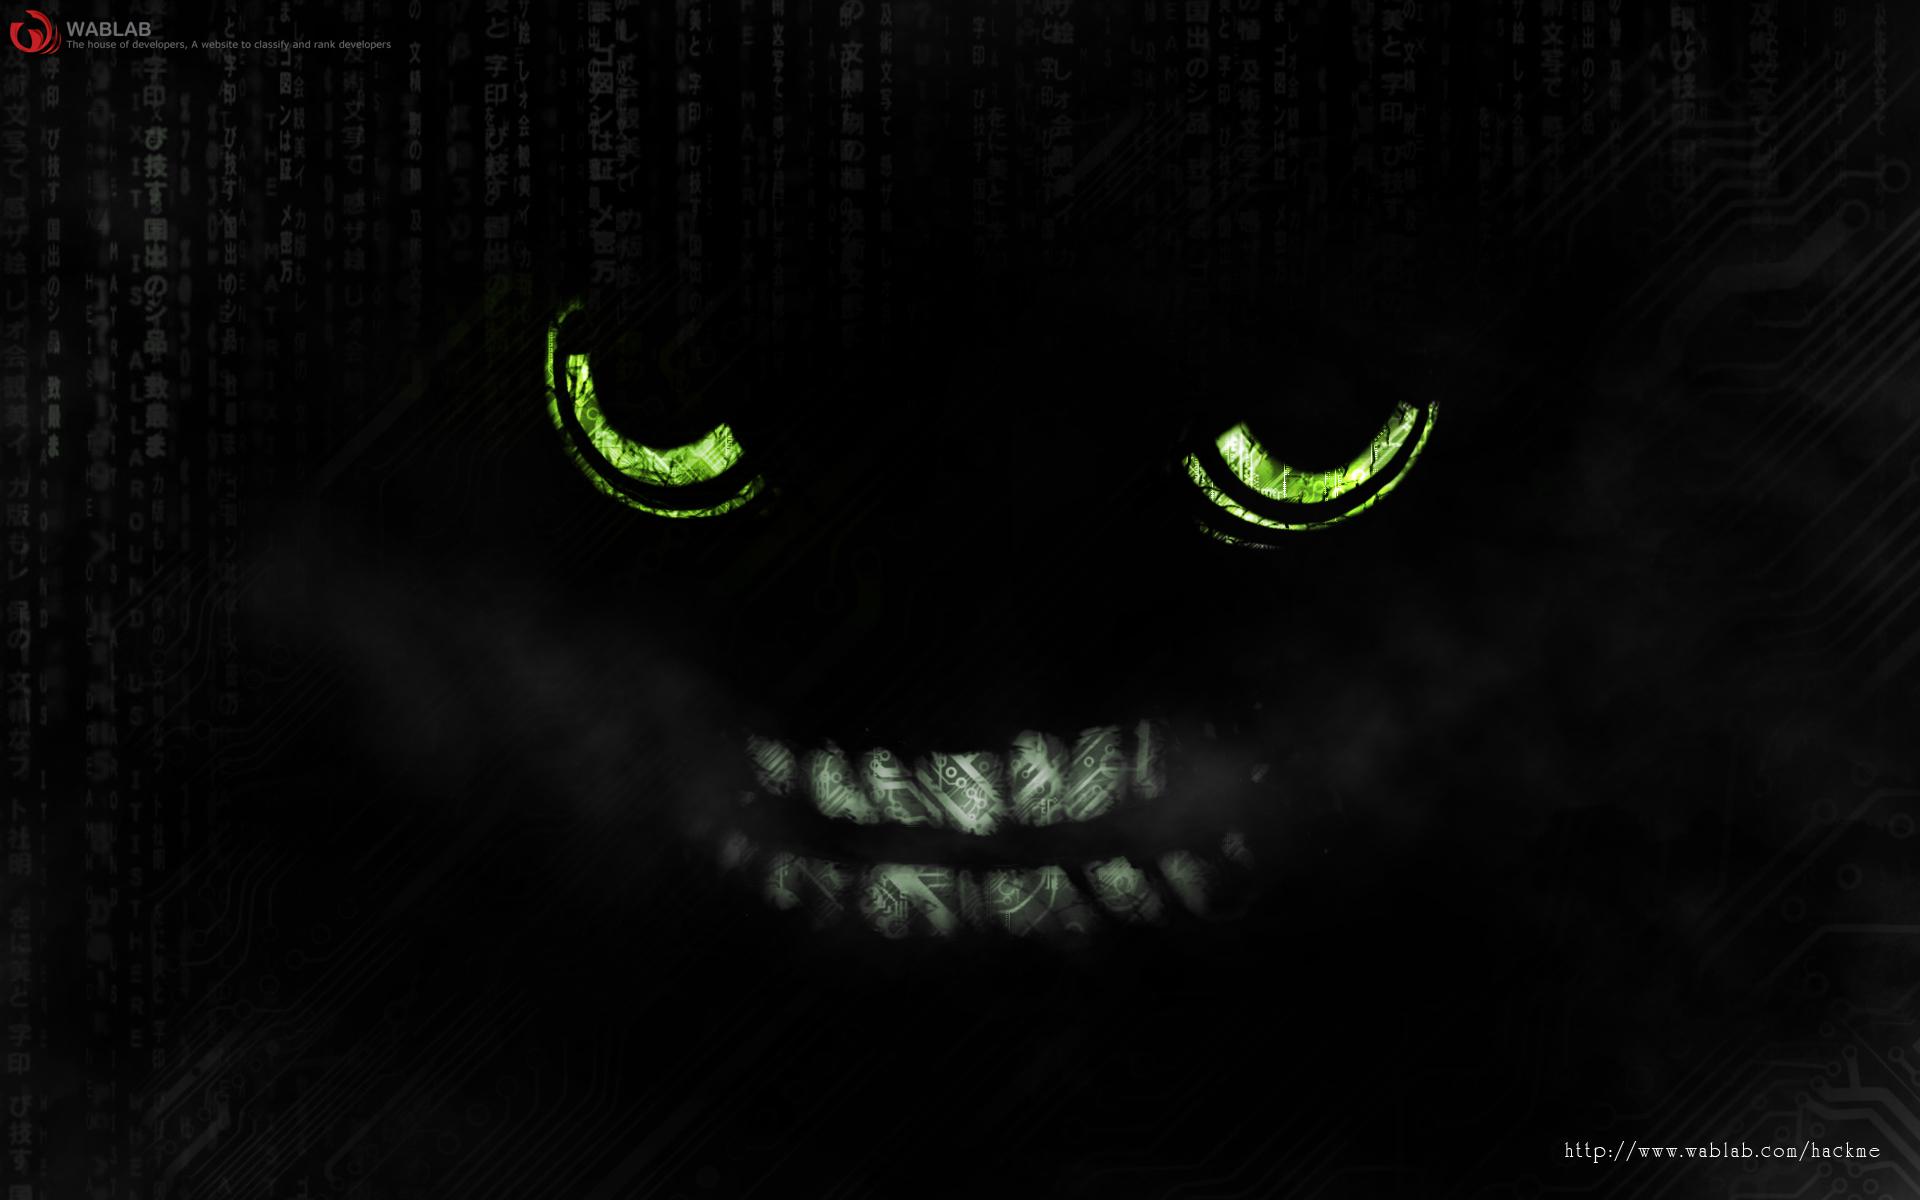 Black Hat Hackers wallpaper   1424881 1920x1200